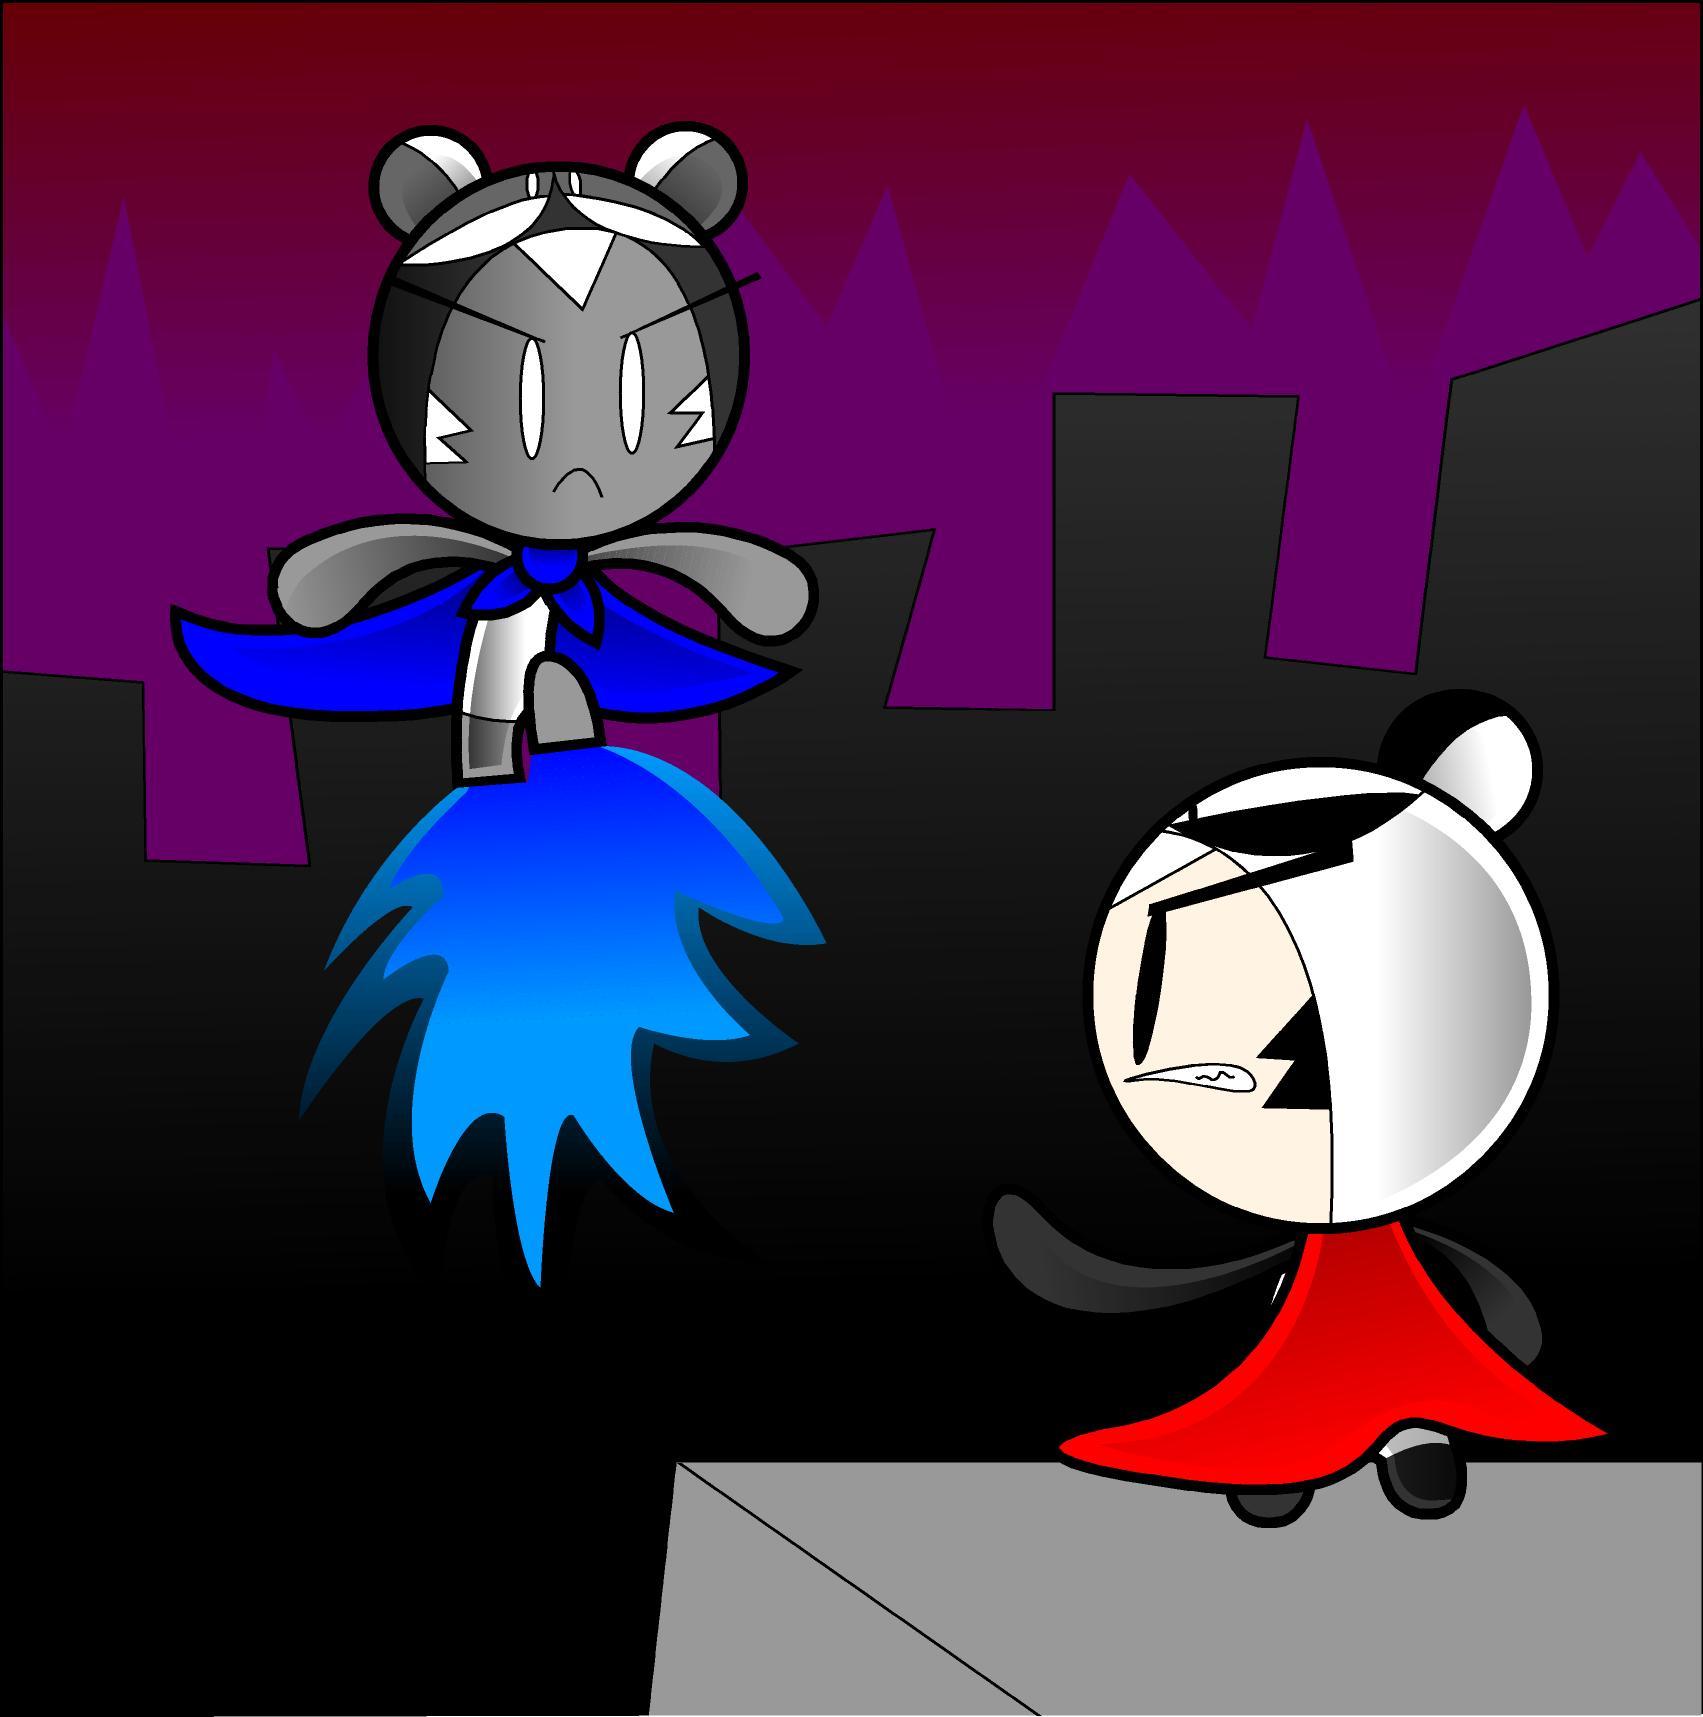 Pandaman vs AntiPandaman